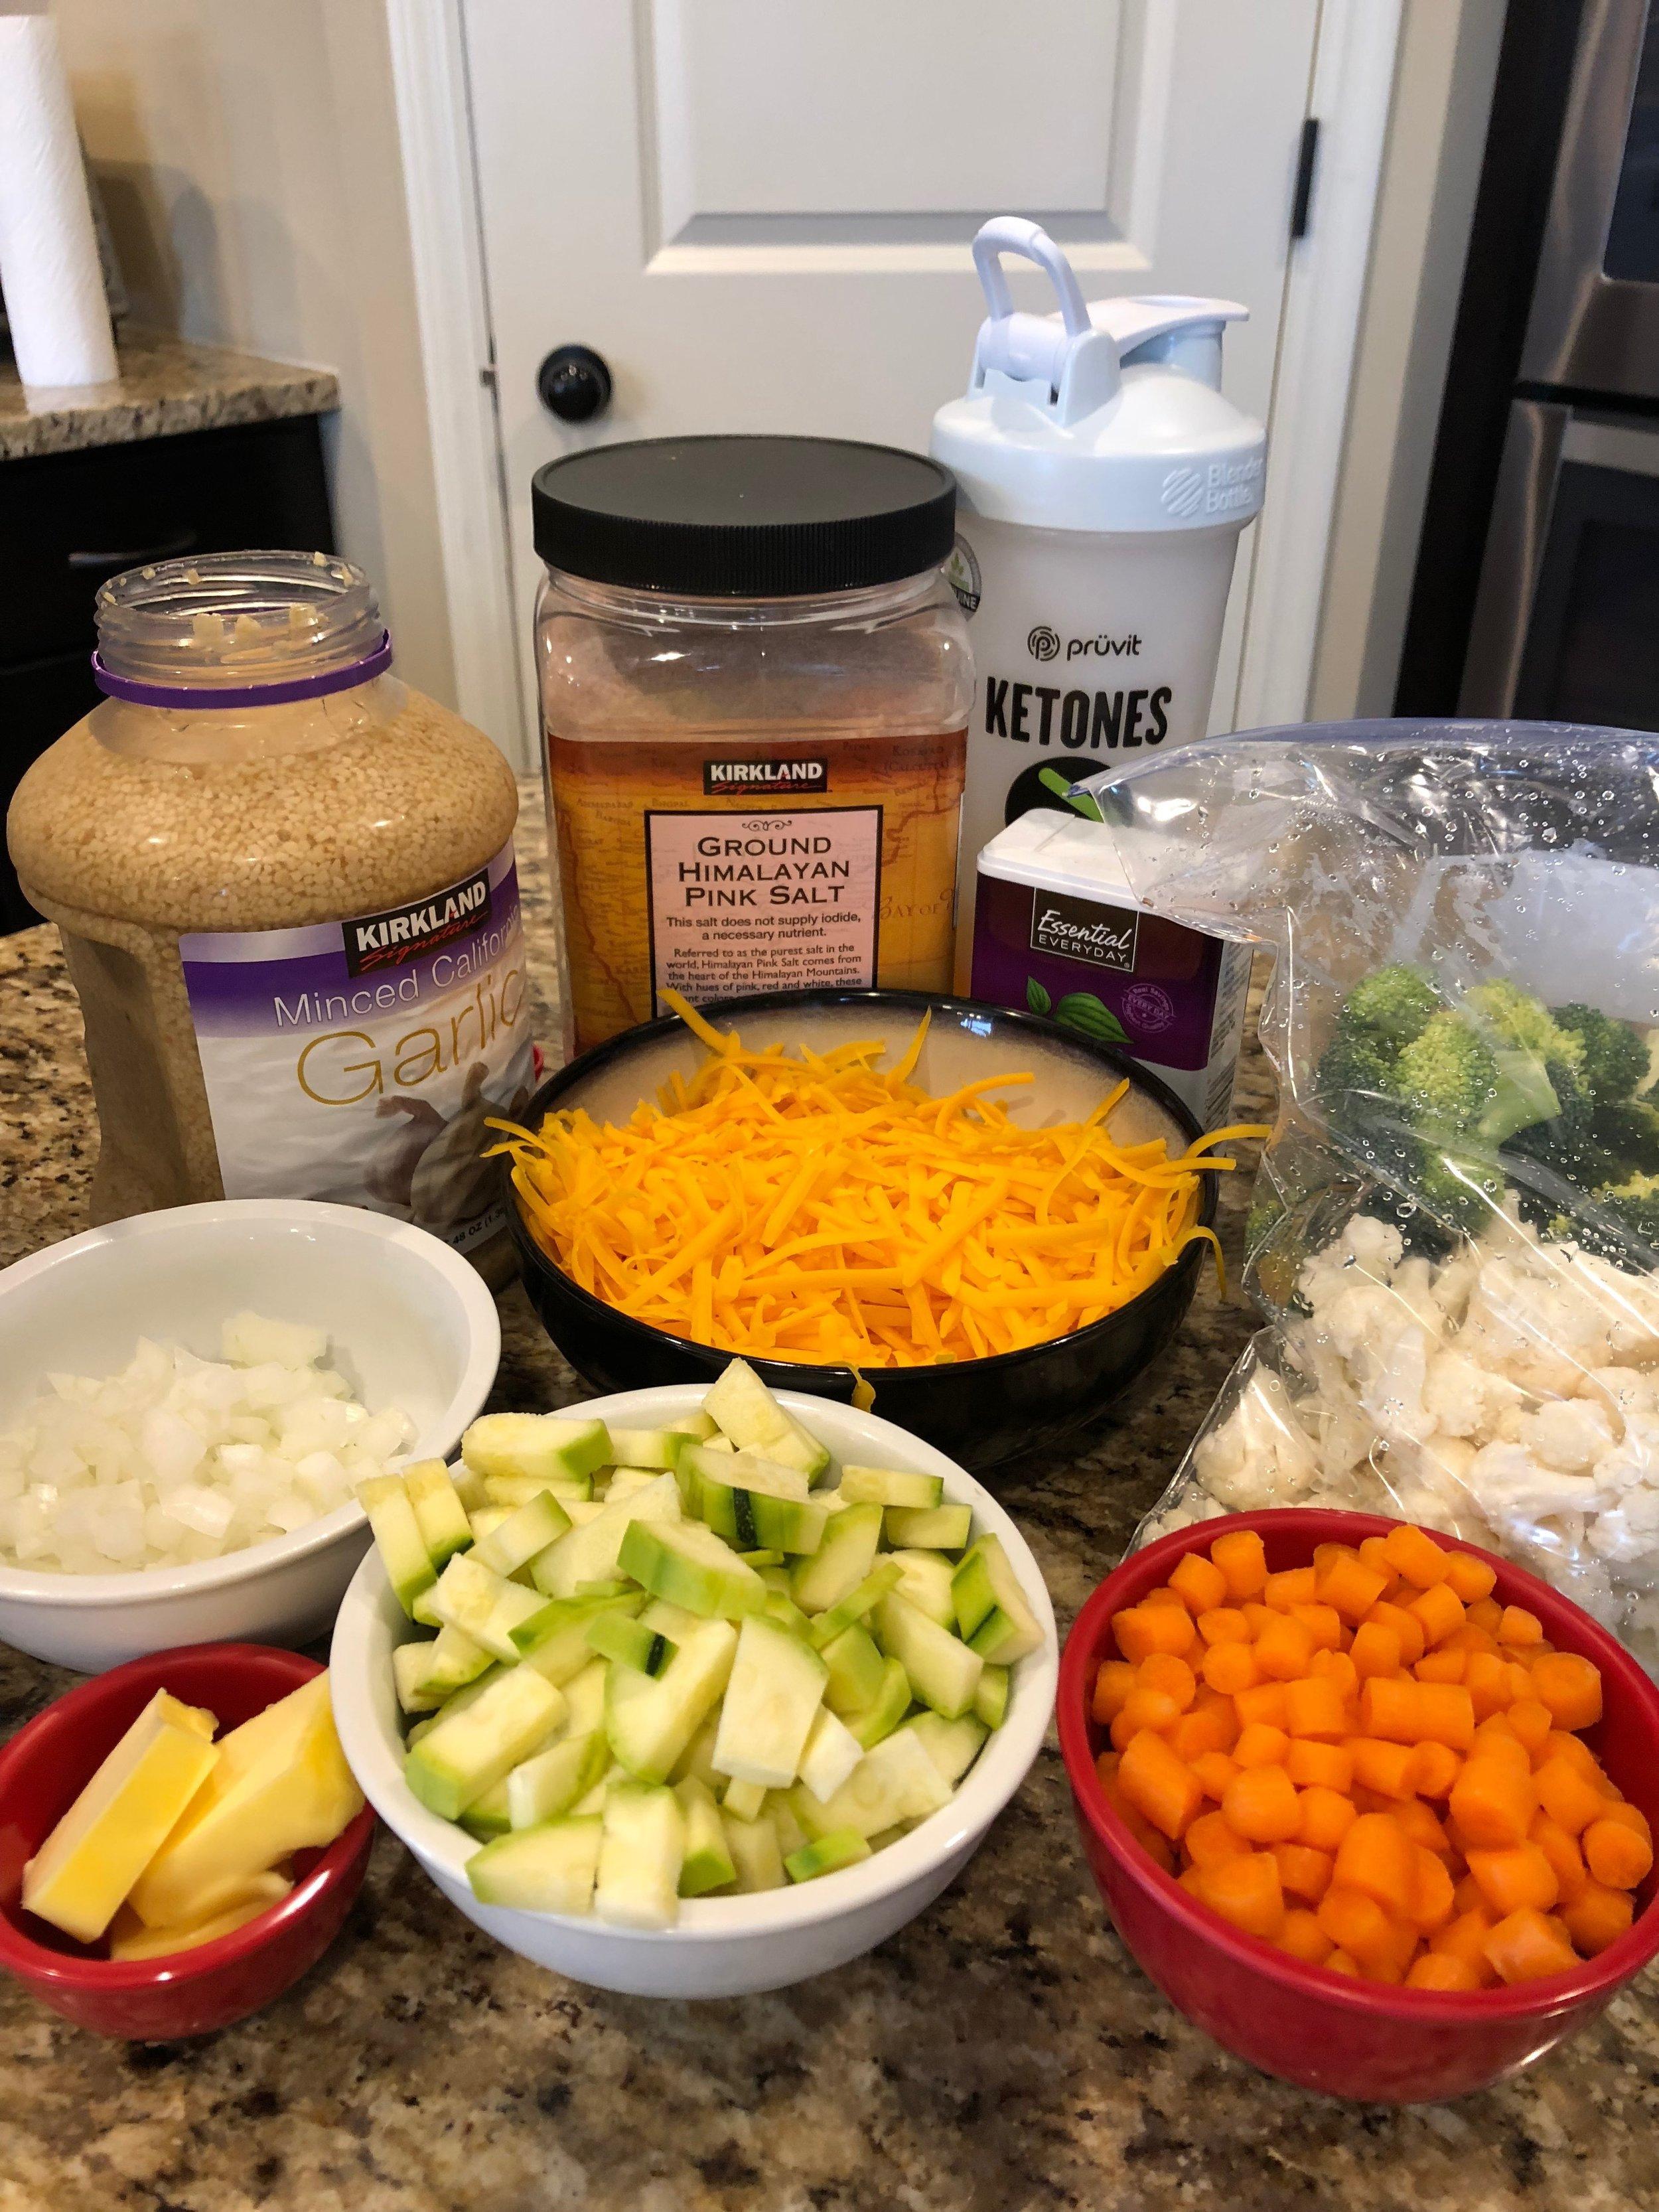 Keto instant pot broccoli and cauliflower soup recipe